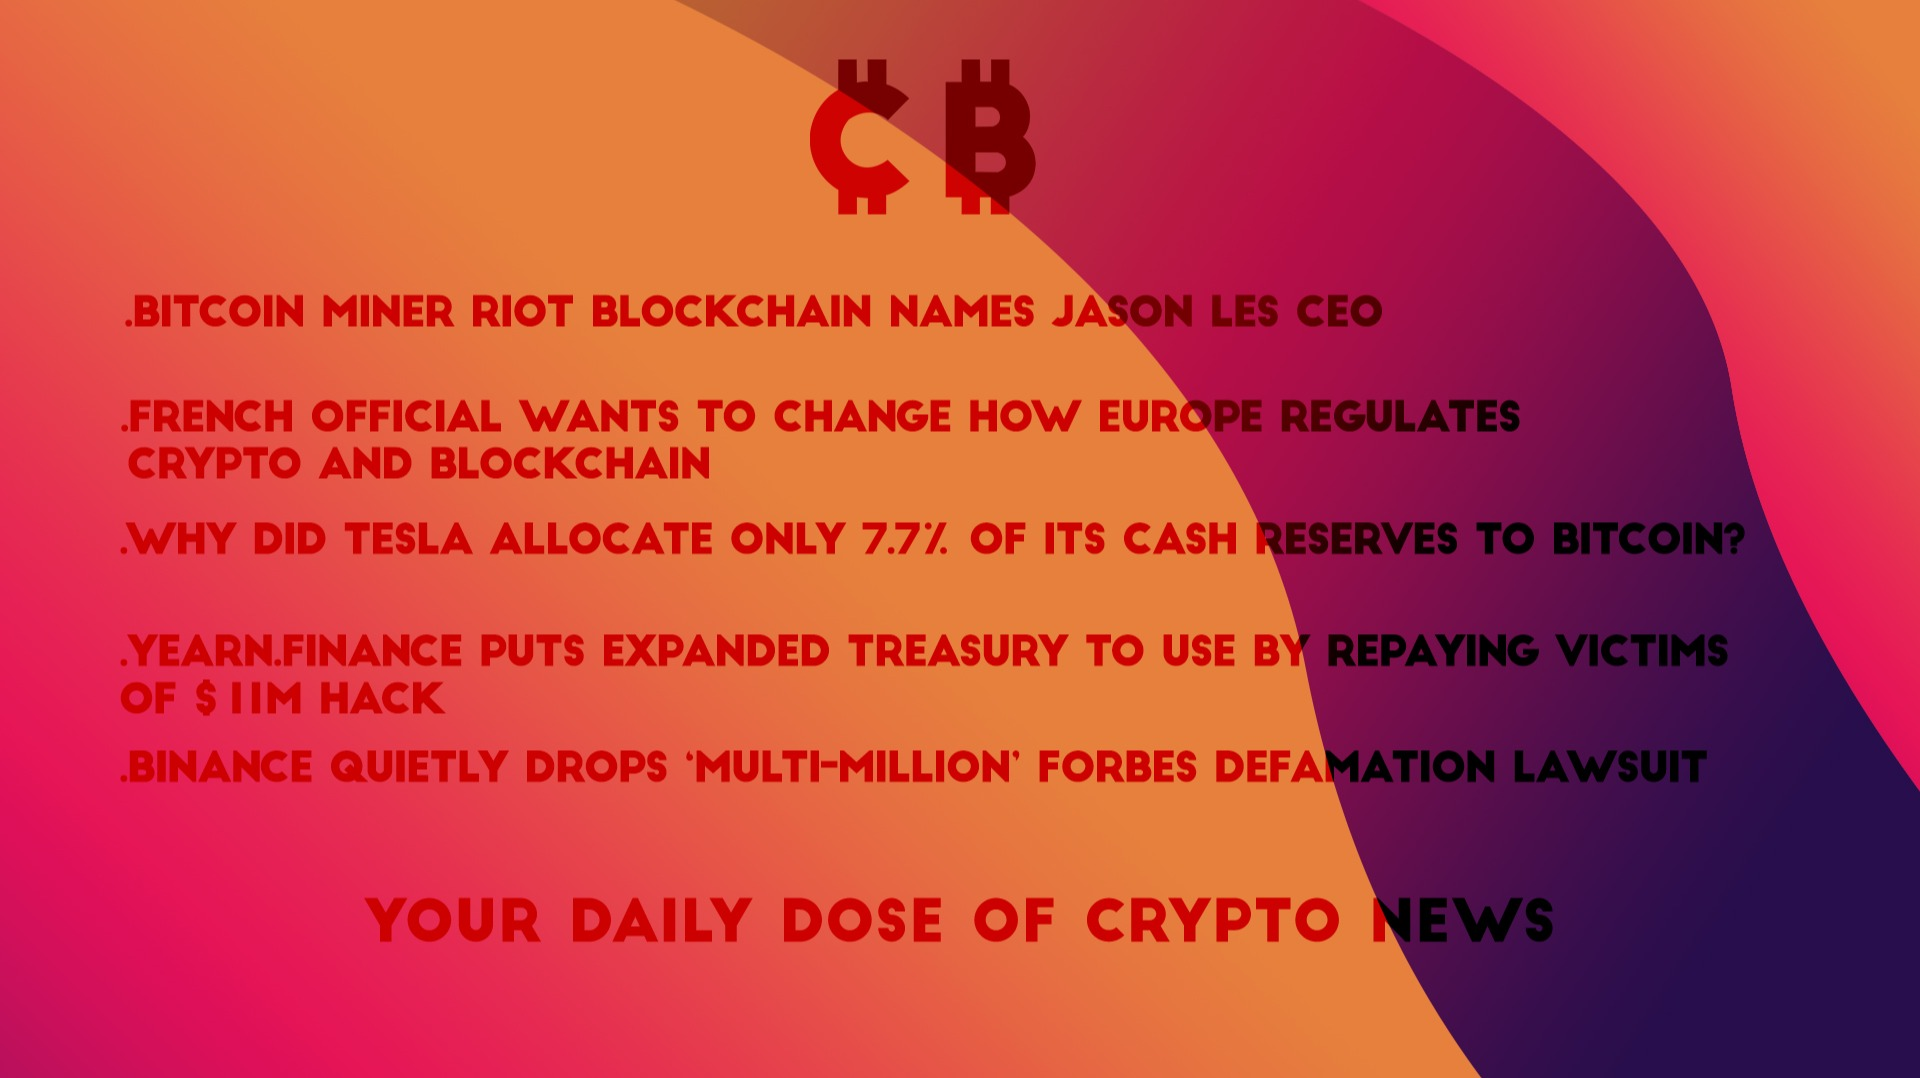 DailyCryptonews by cryptoborges - 09/02/2021